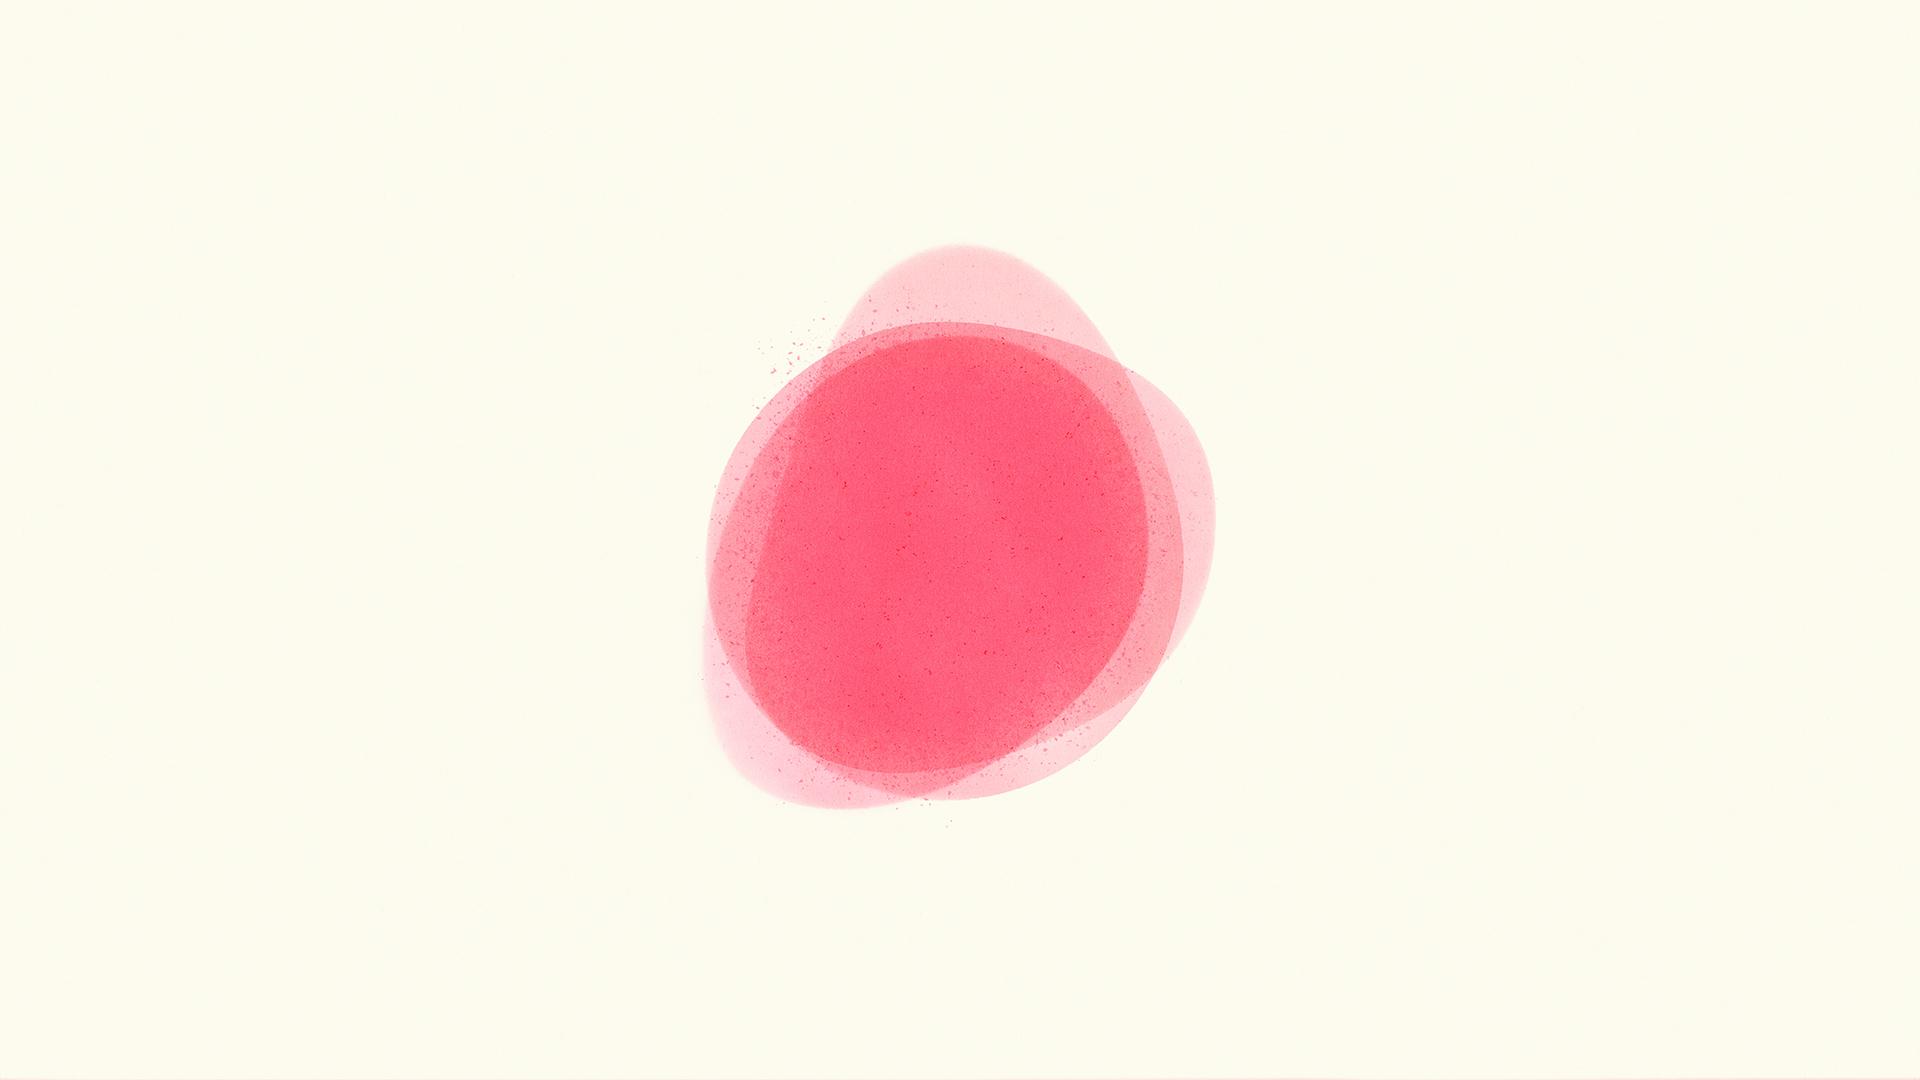 CNN17_01_Colorscope_s010_Pink_Blob.jpg